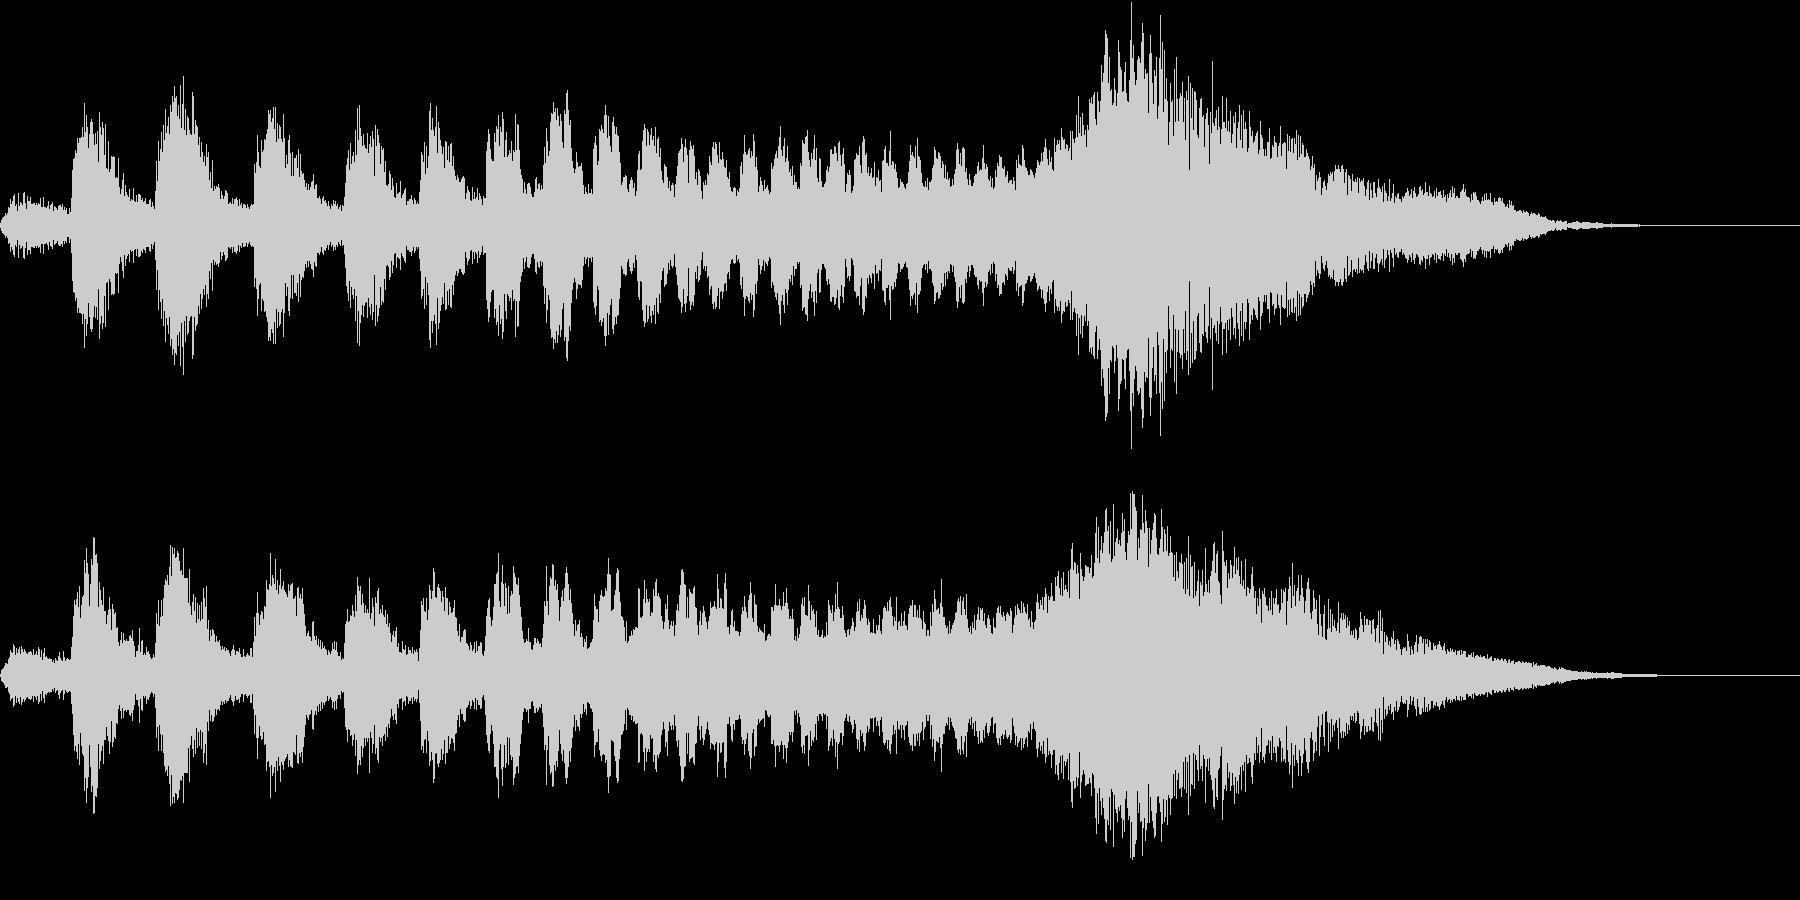 CINEMATIC RISER_07の未再生の波形